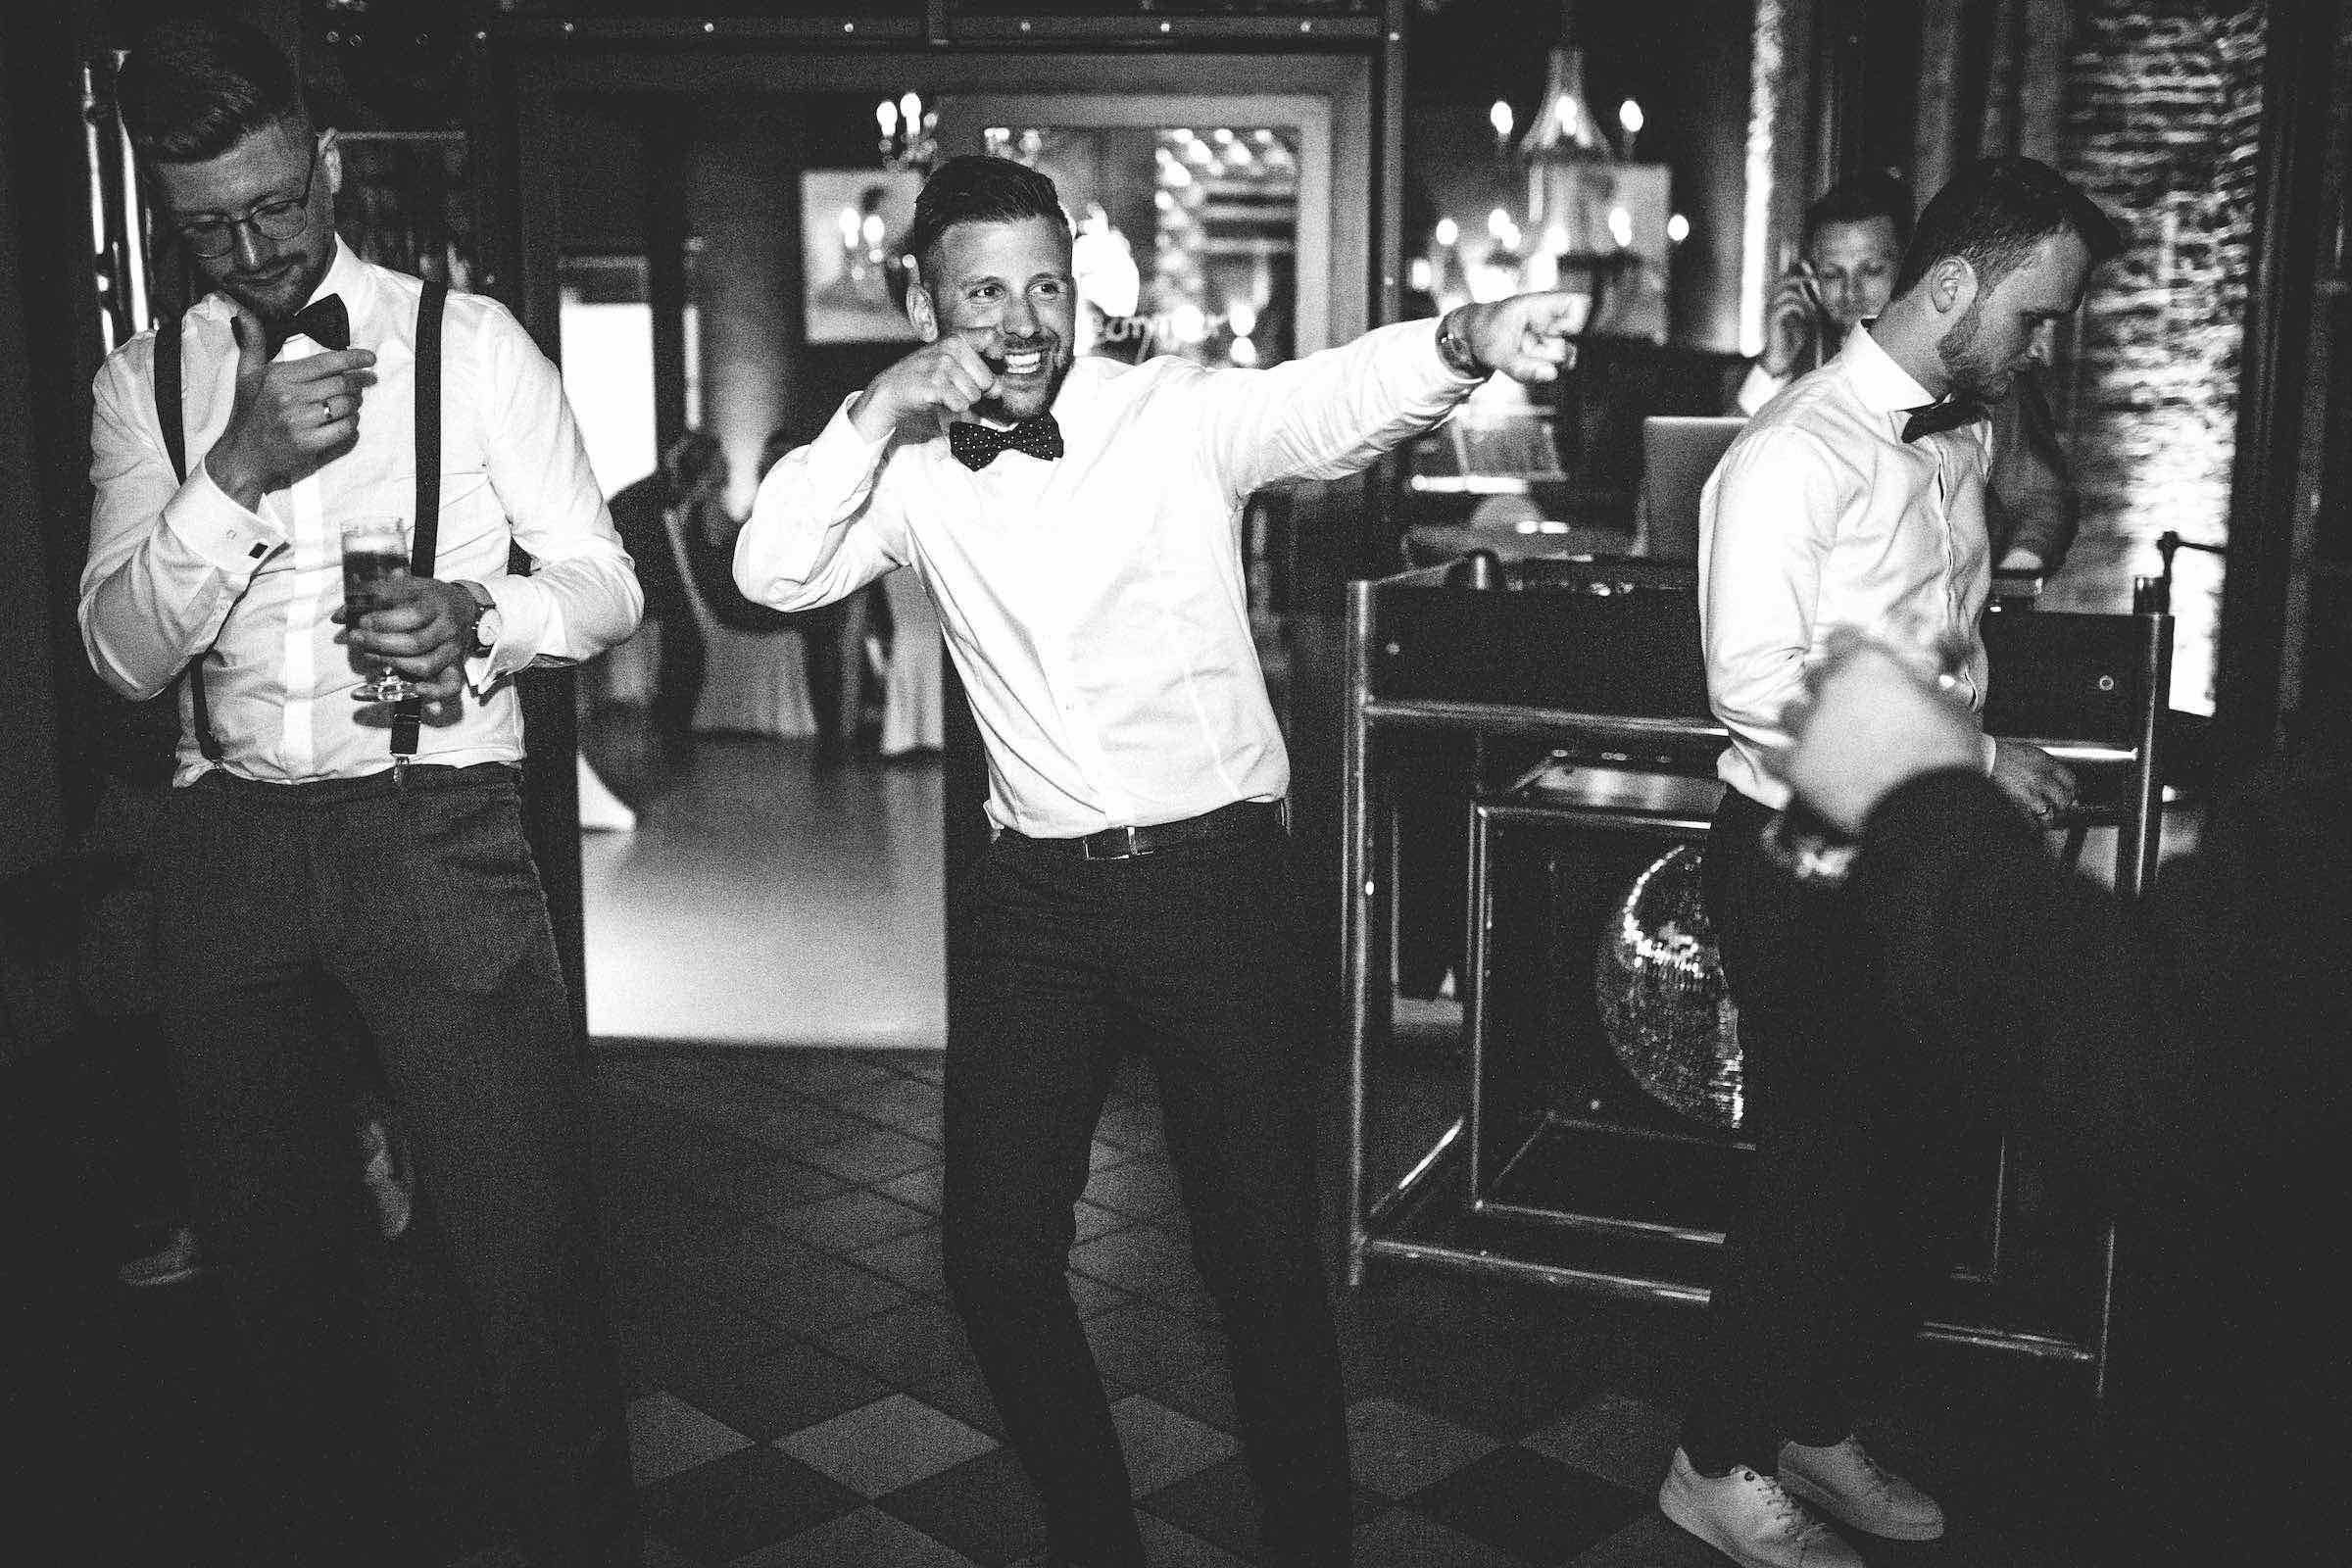 DJ | Hochzeit | Mieten | DJ | Agentur | Hamburg | DJ | Service | DJ | Feier | Hochzeits | DJ | Messe | DJ | Firmenevent | Firmenfeier | DJ | Geburtstag | Discjockey | Weihnachtsfeier | DJ | Sommerfest | Event | Buchen | Hamburgfeiert